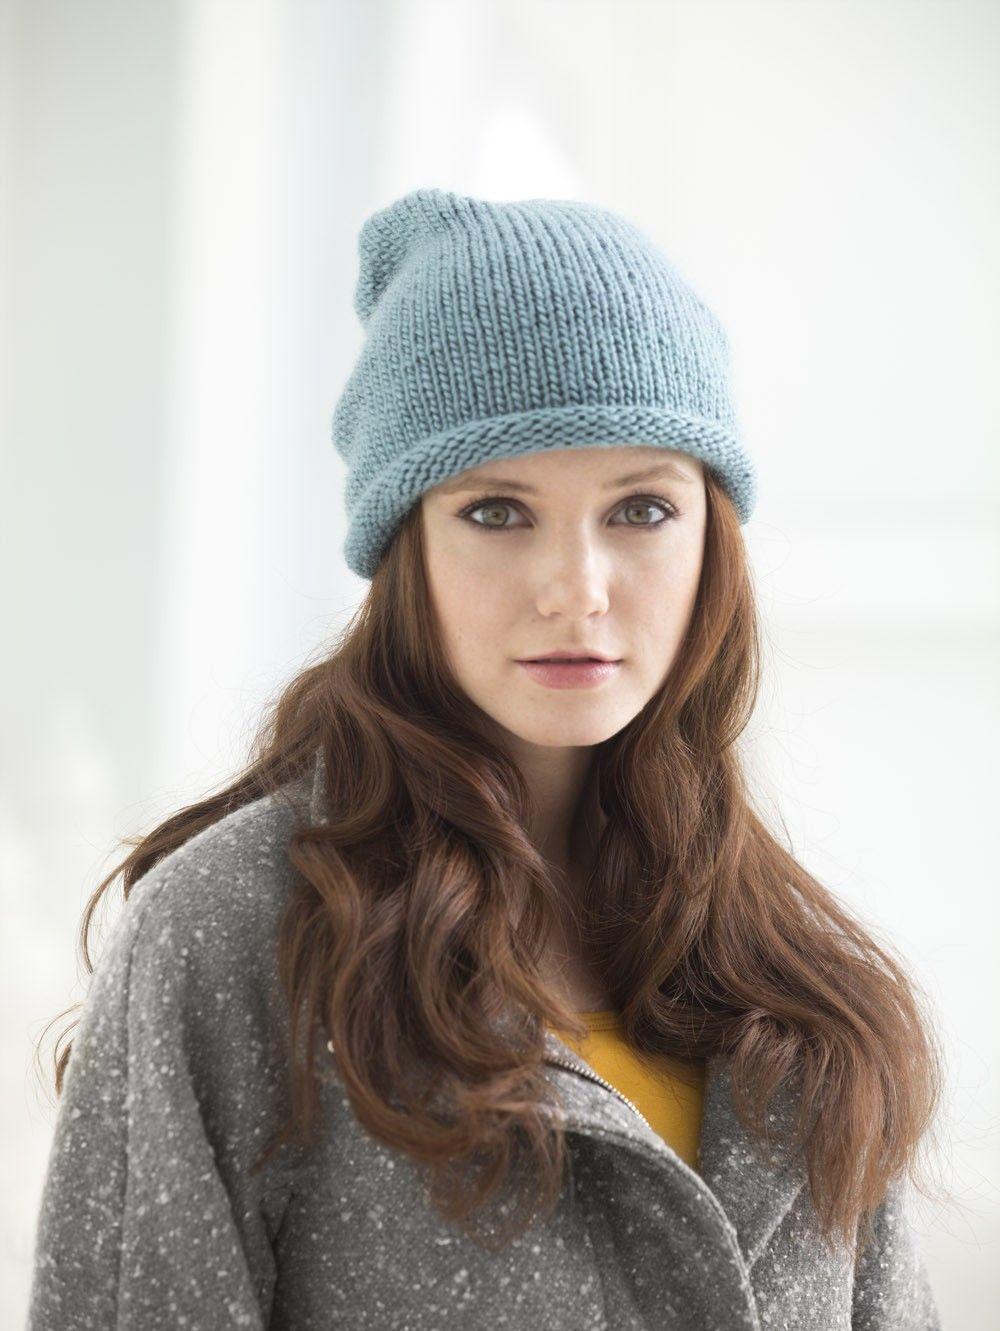 Hip Slouch Hat (Knit)   Knitting   Pinterest